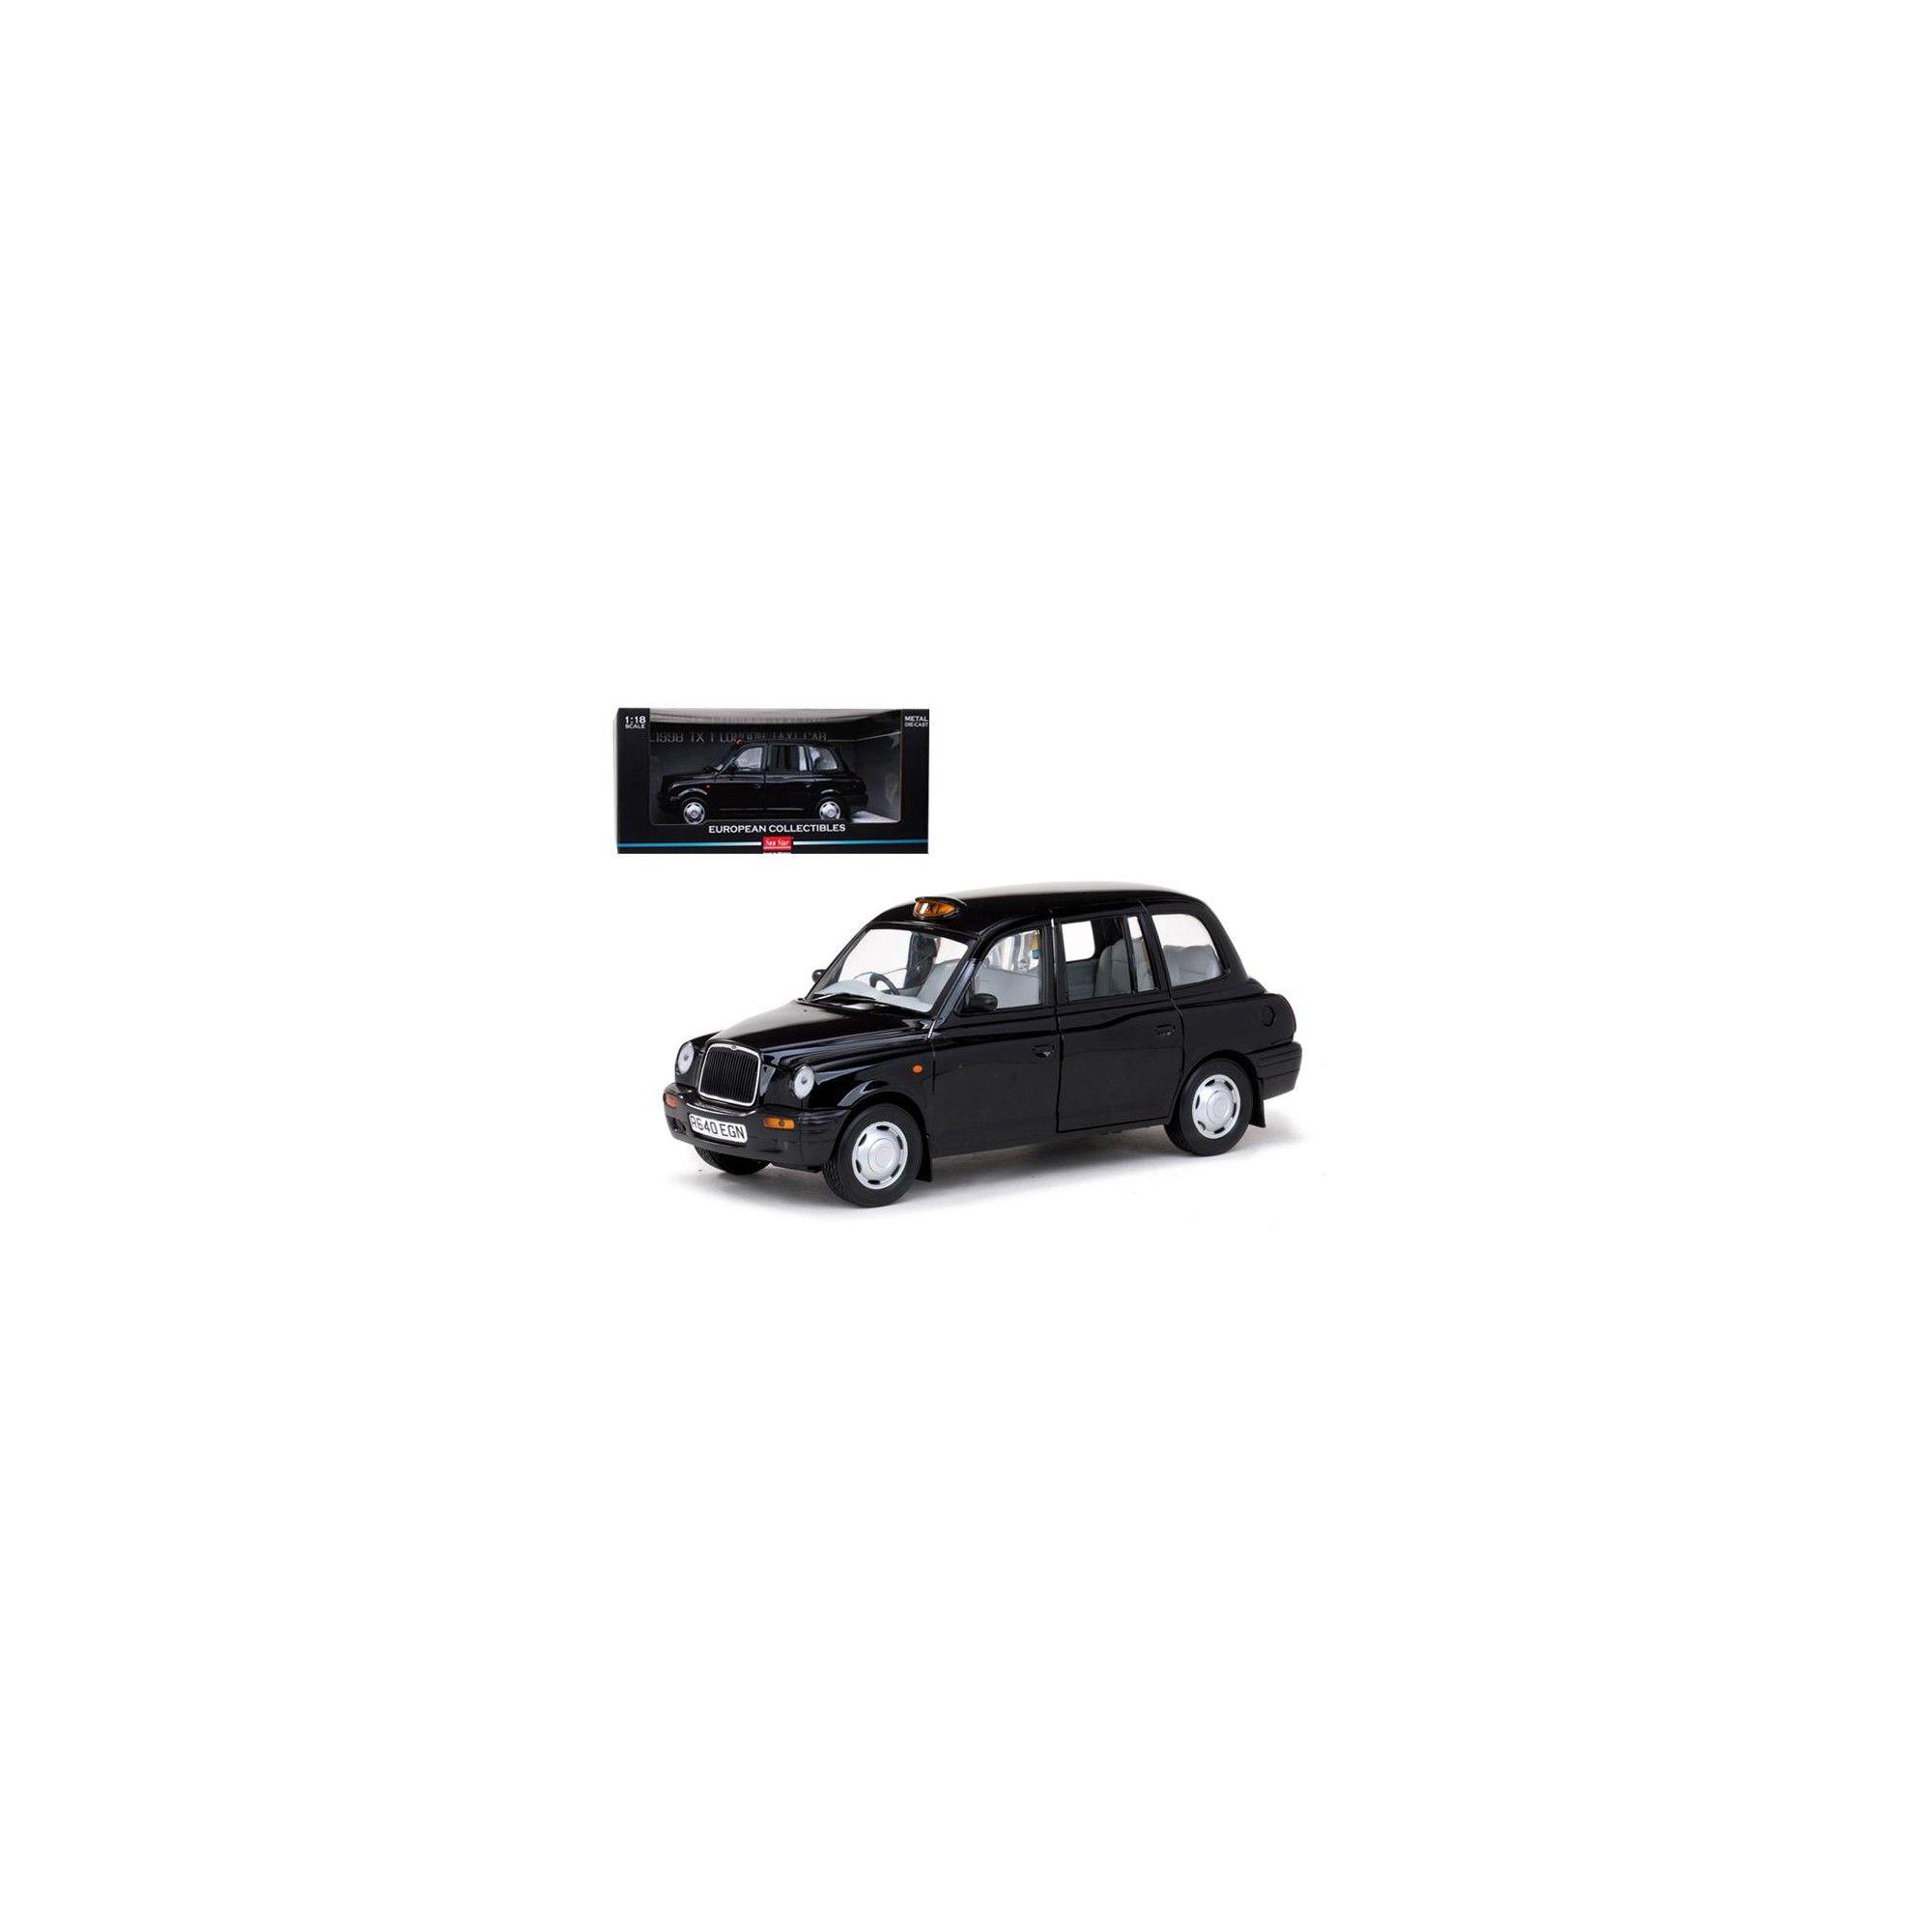 Hausdesign mit vier schlafzimmern  london taxi cab black  diecast model car by sunstar in